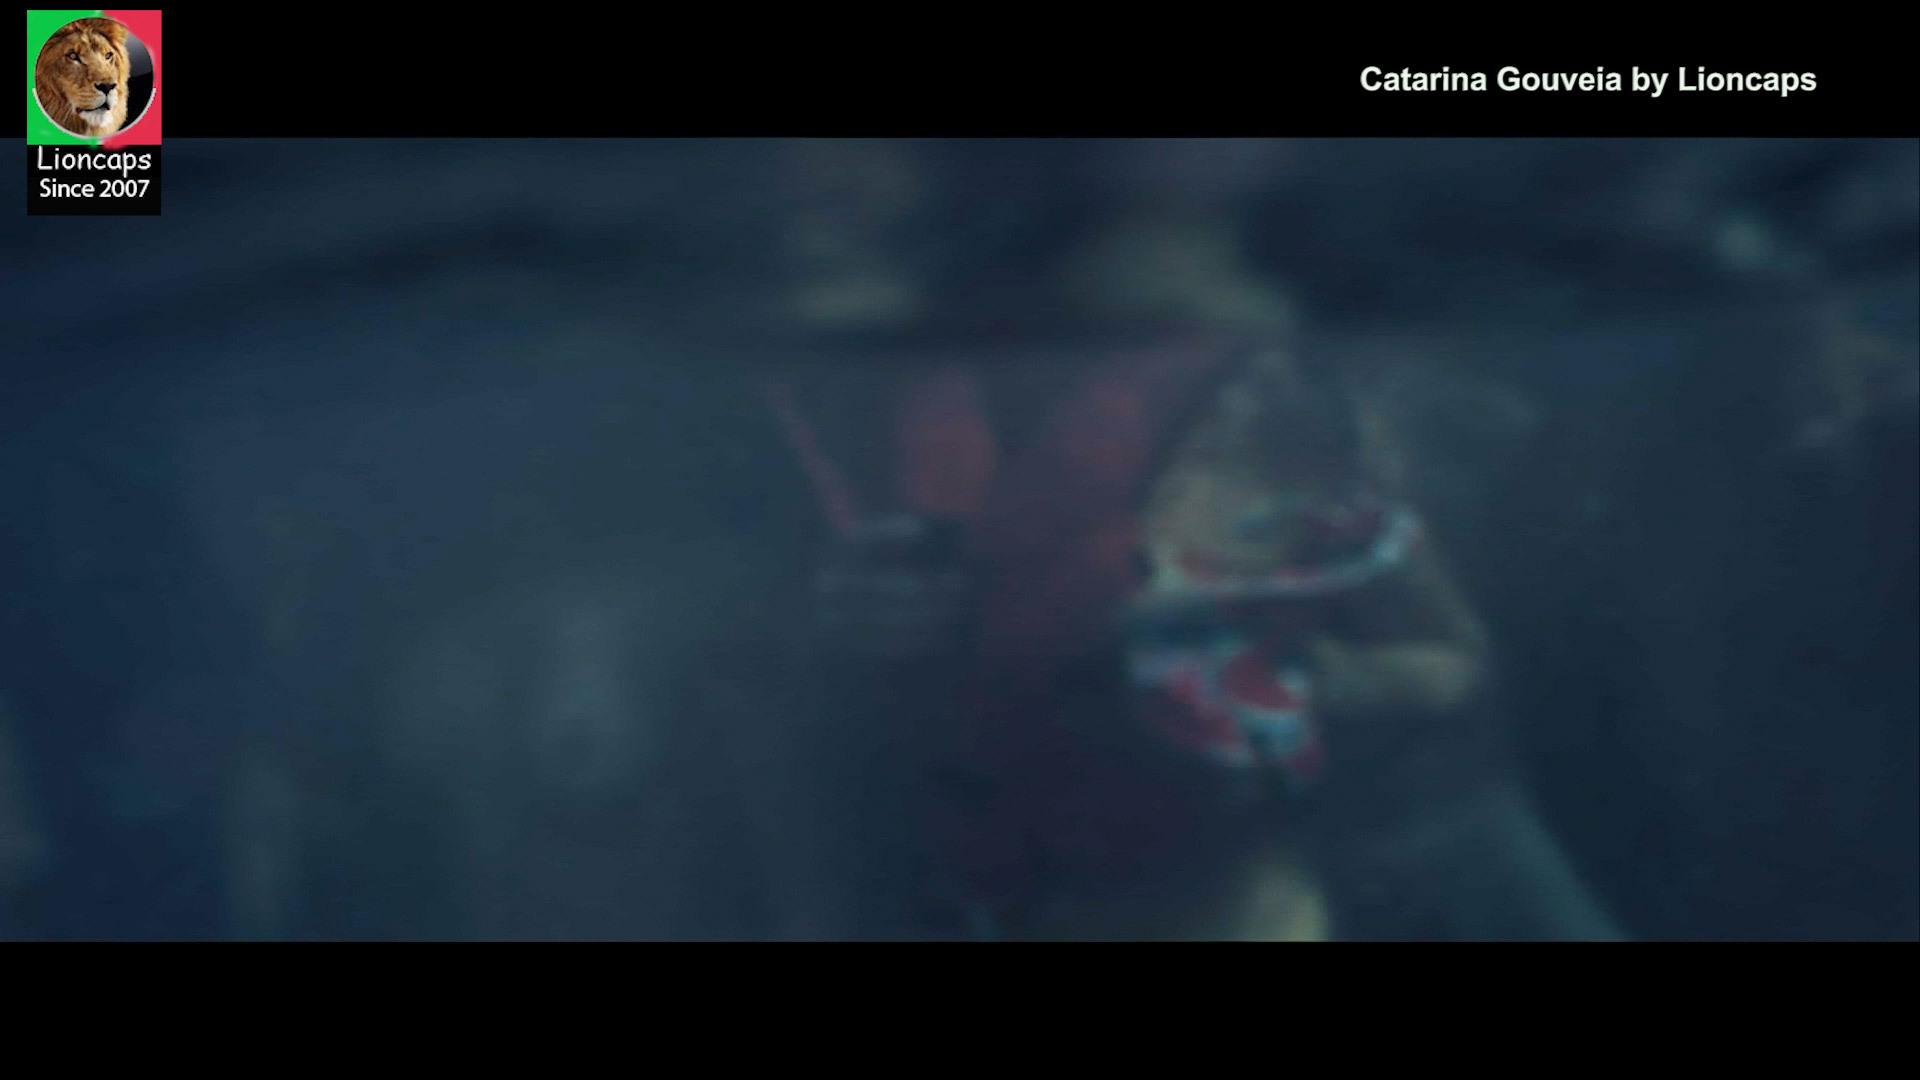 catarina_gouveia_perdidos_lioncaps_09_05_2021_07 (13).jpg